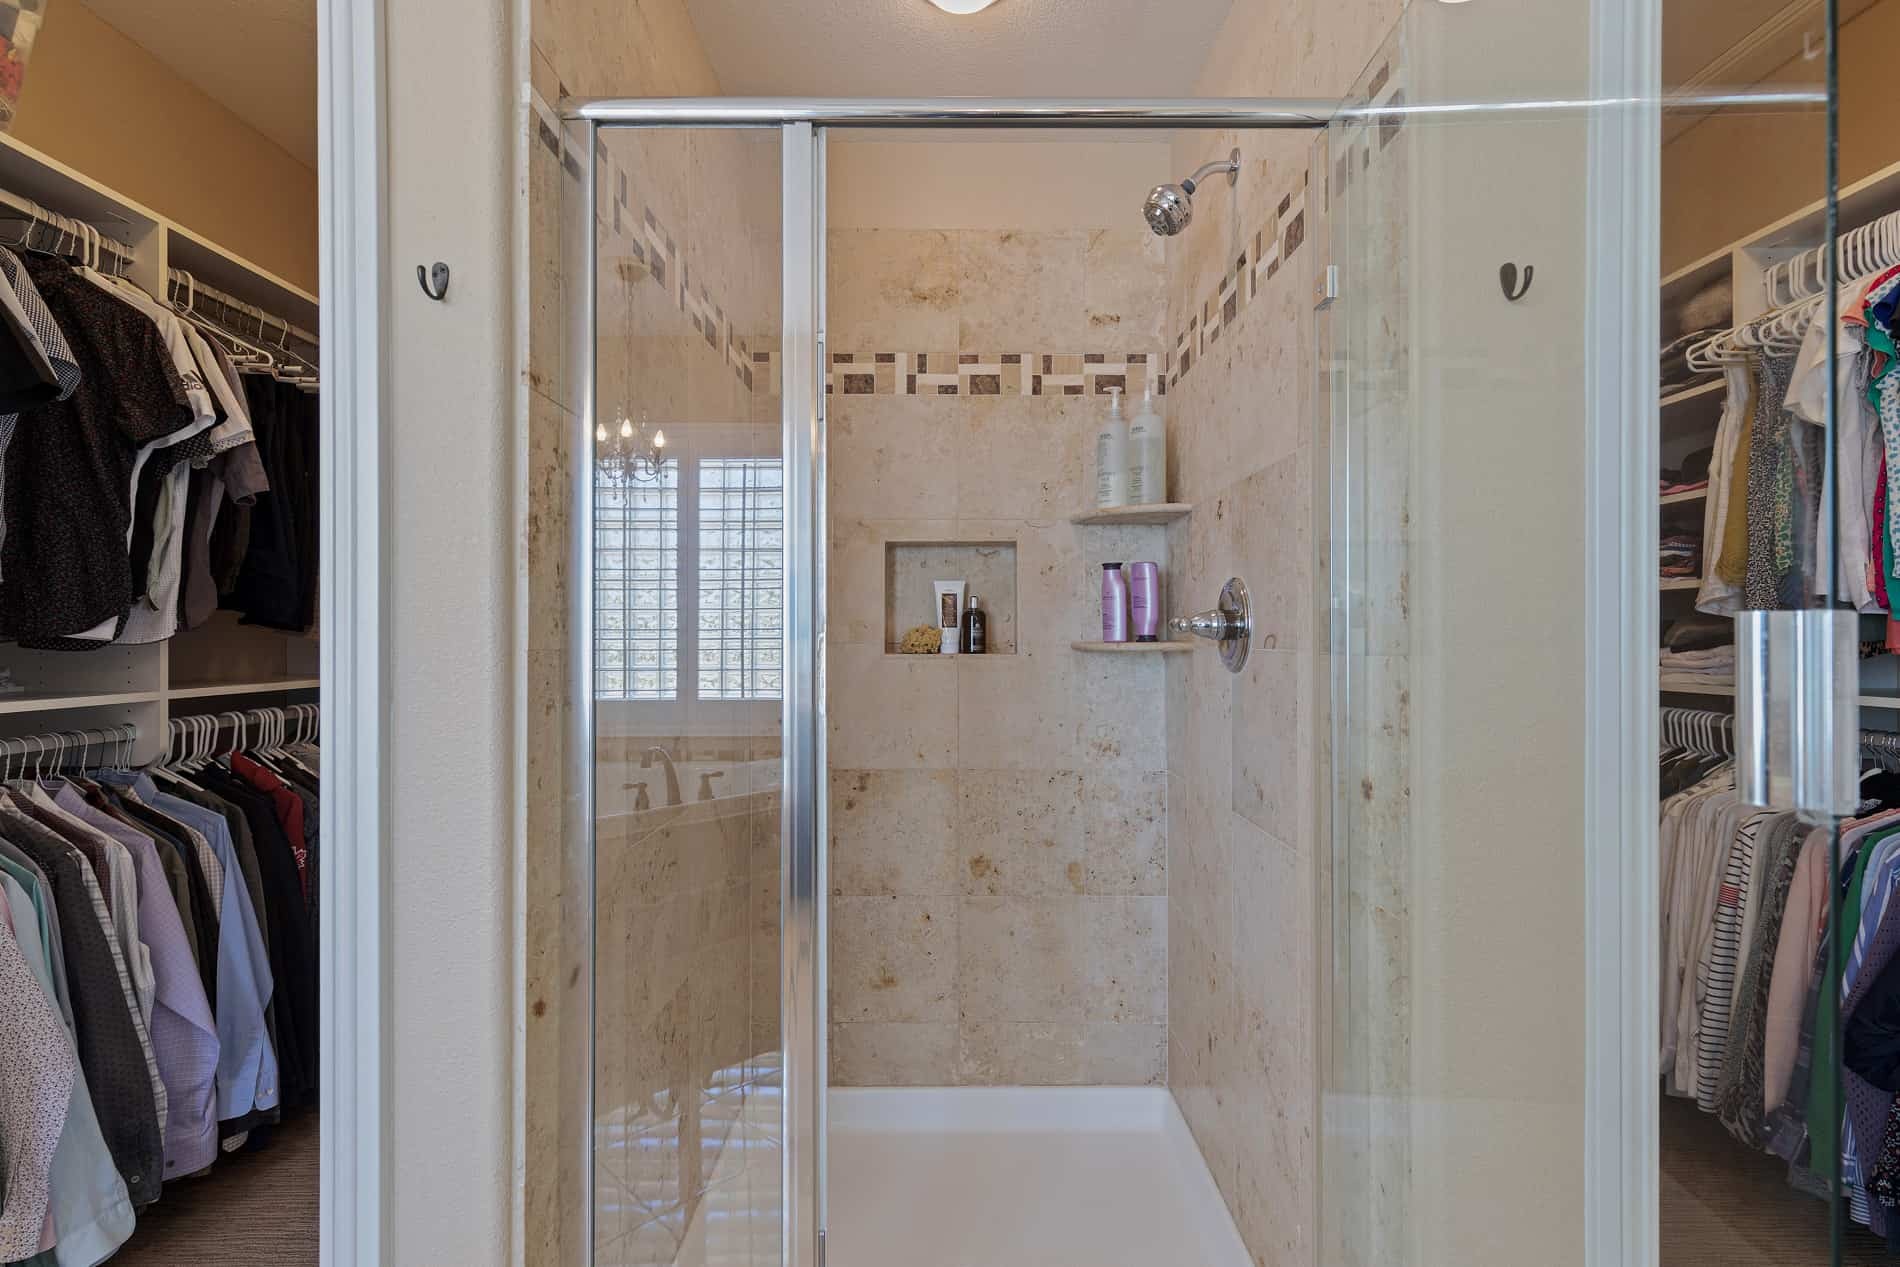 las-vegas-luxry-real-estate-realtor-rob-jensen-company-12108-vista-linda-avenue-the-paseos046